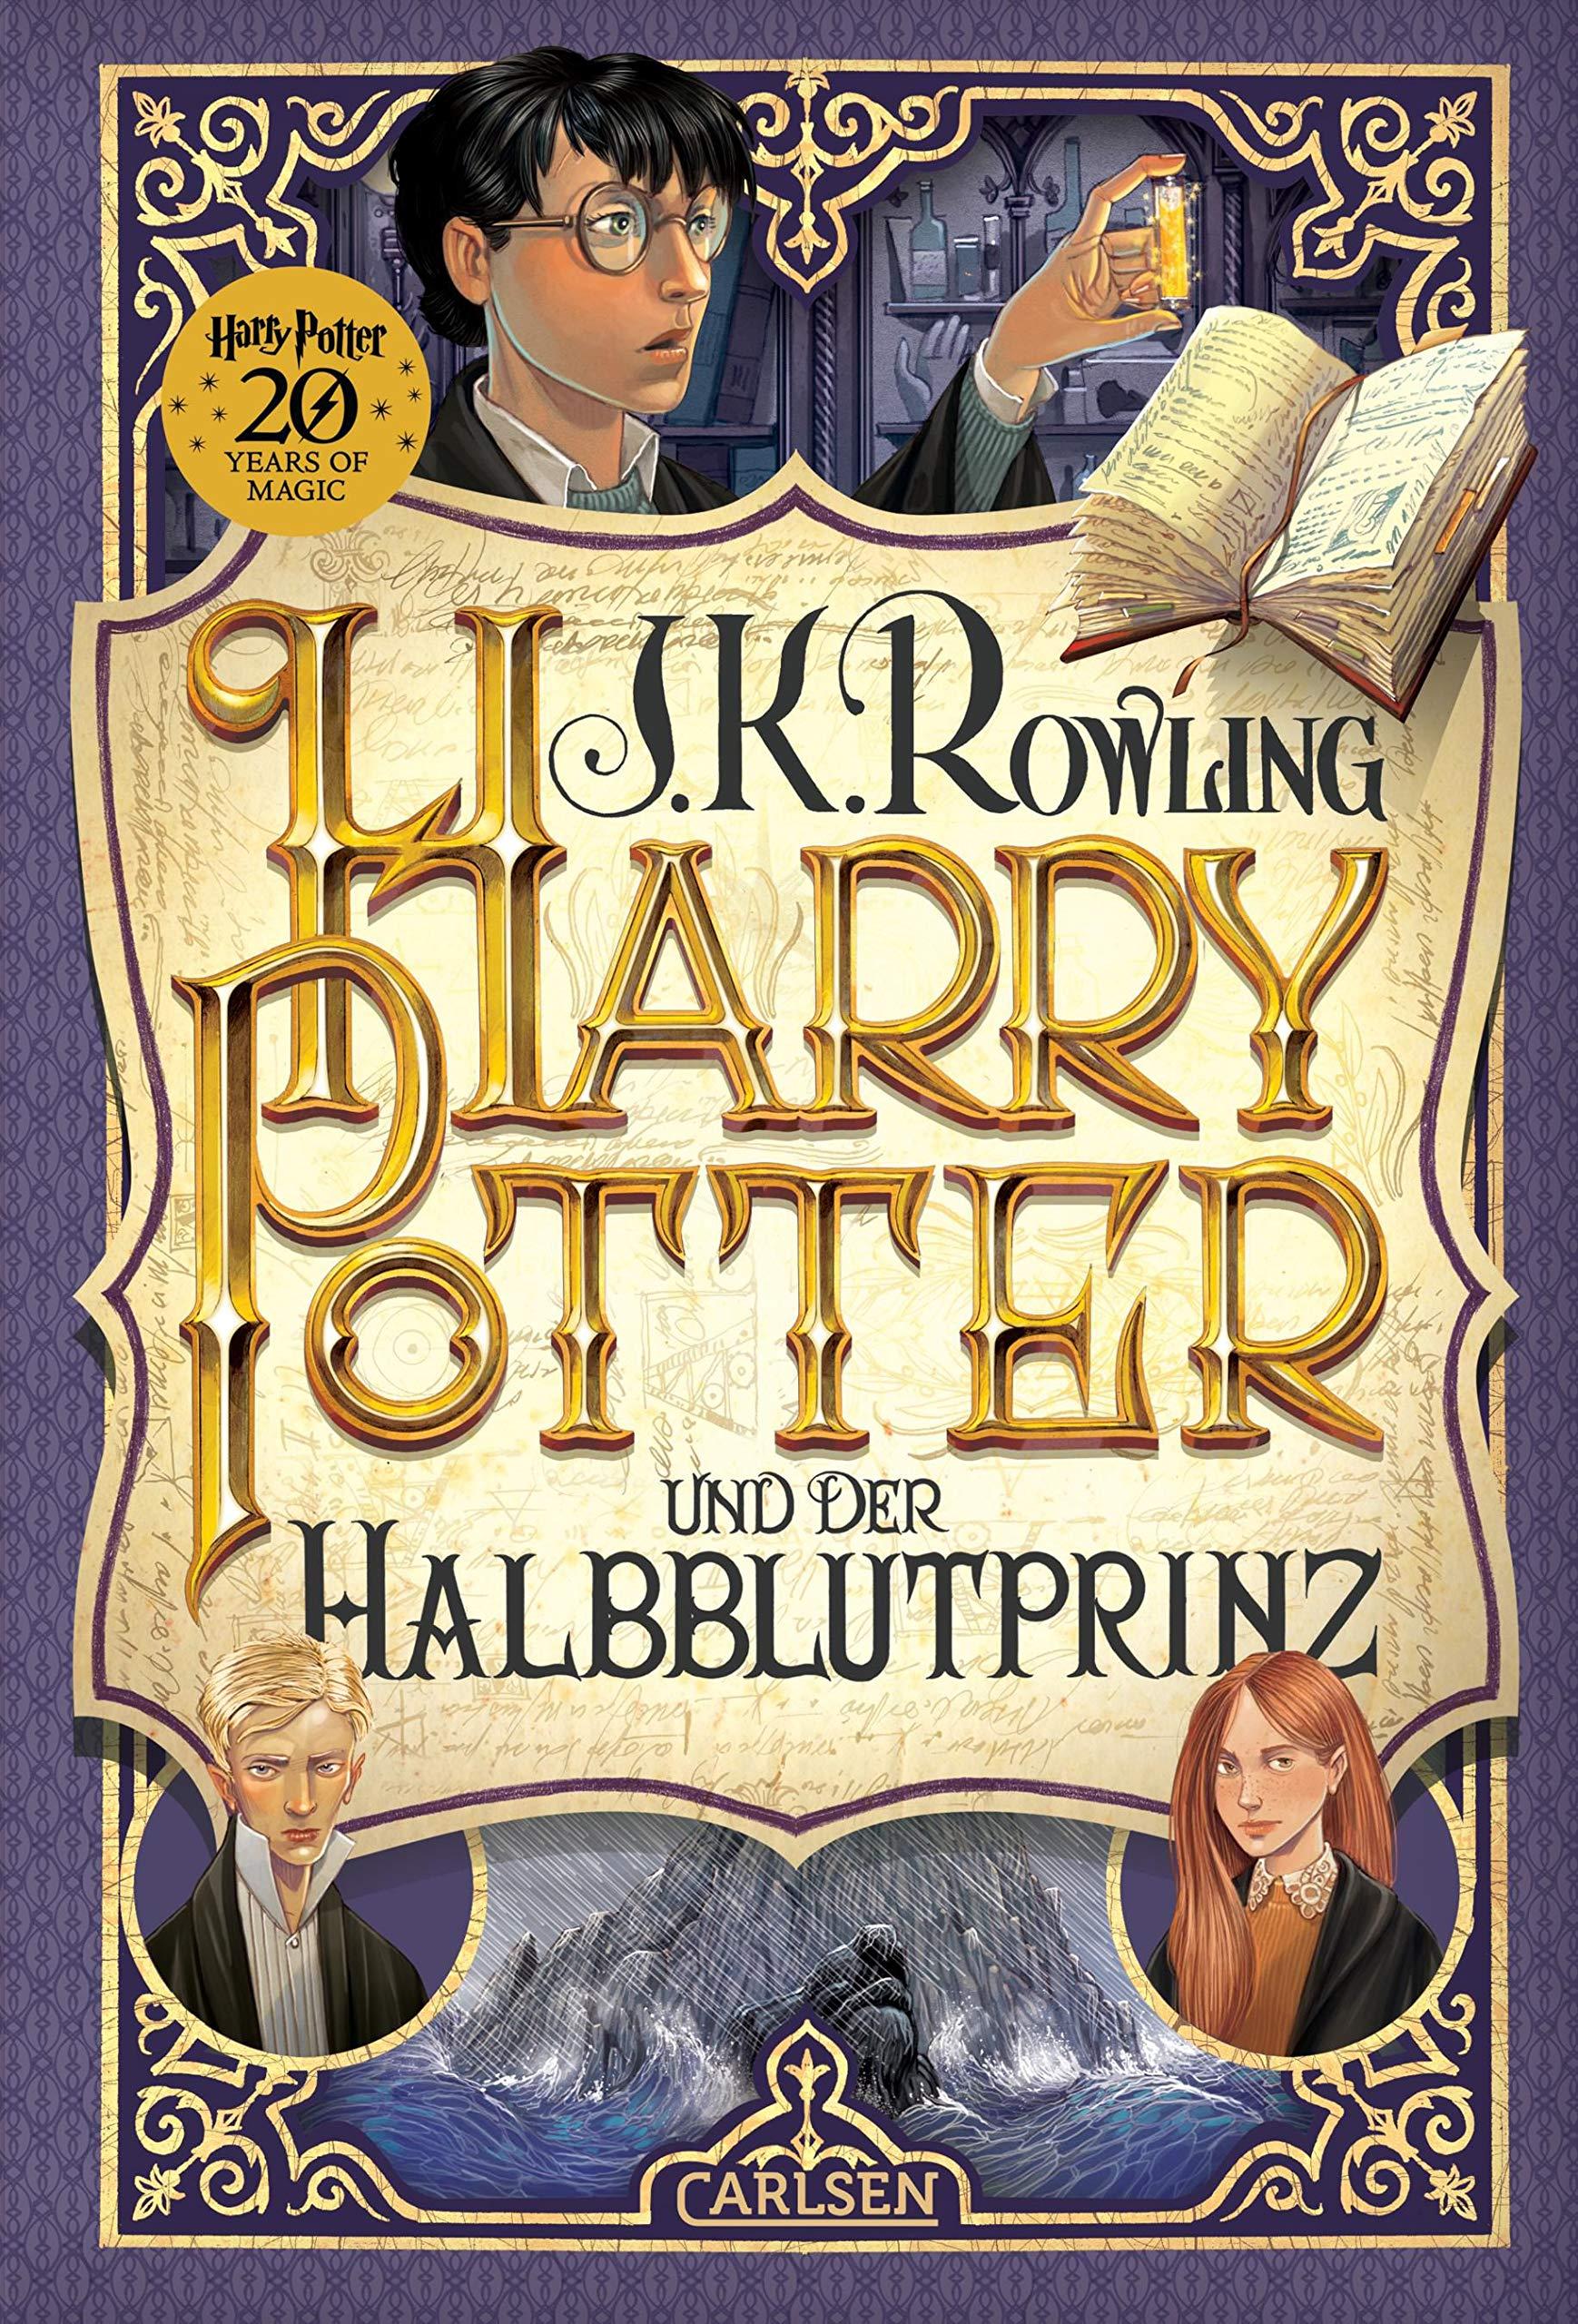 Harry Potter und der Halbblutprinz (Harry Potter 6) Gebundenes Buch – 31. August 2018 J.K. Rowling Klaus Fritz Carlsen 3551557462